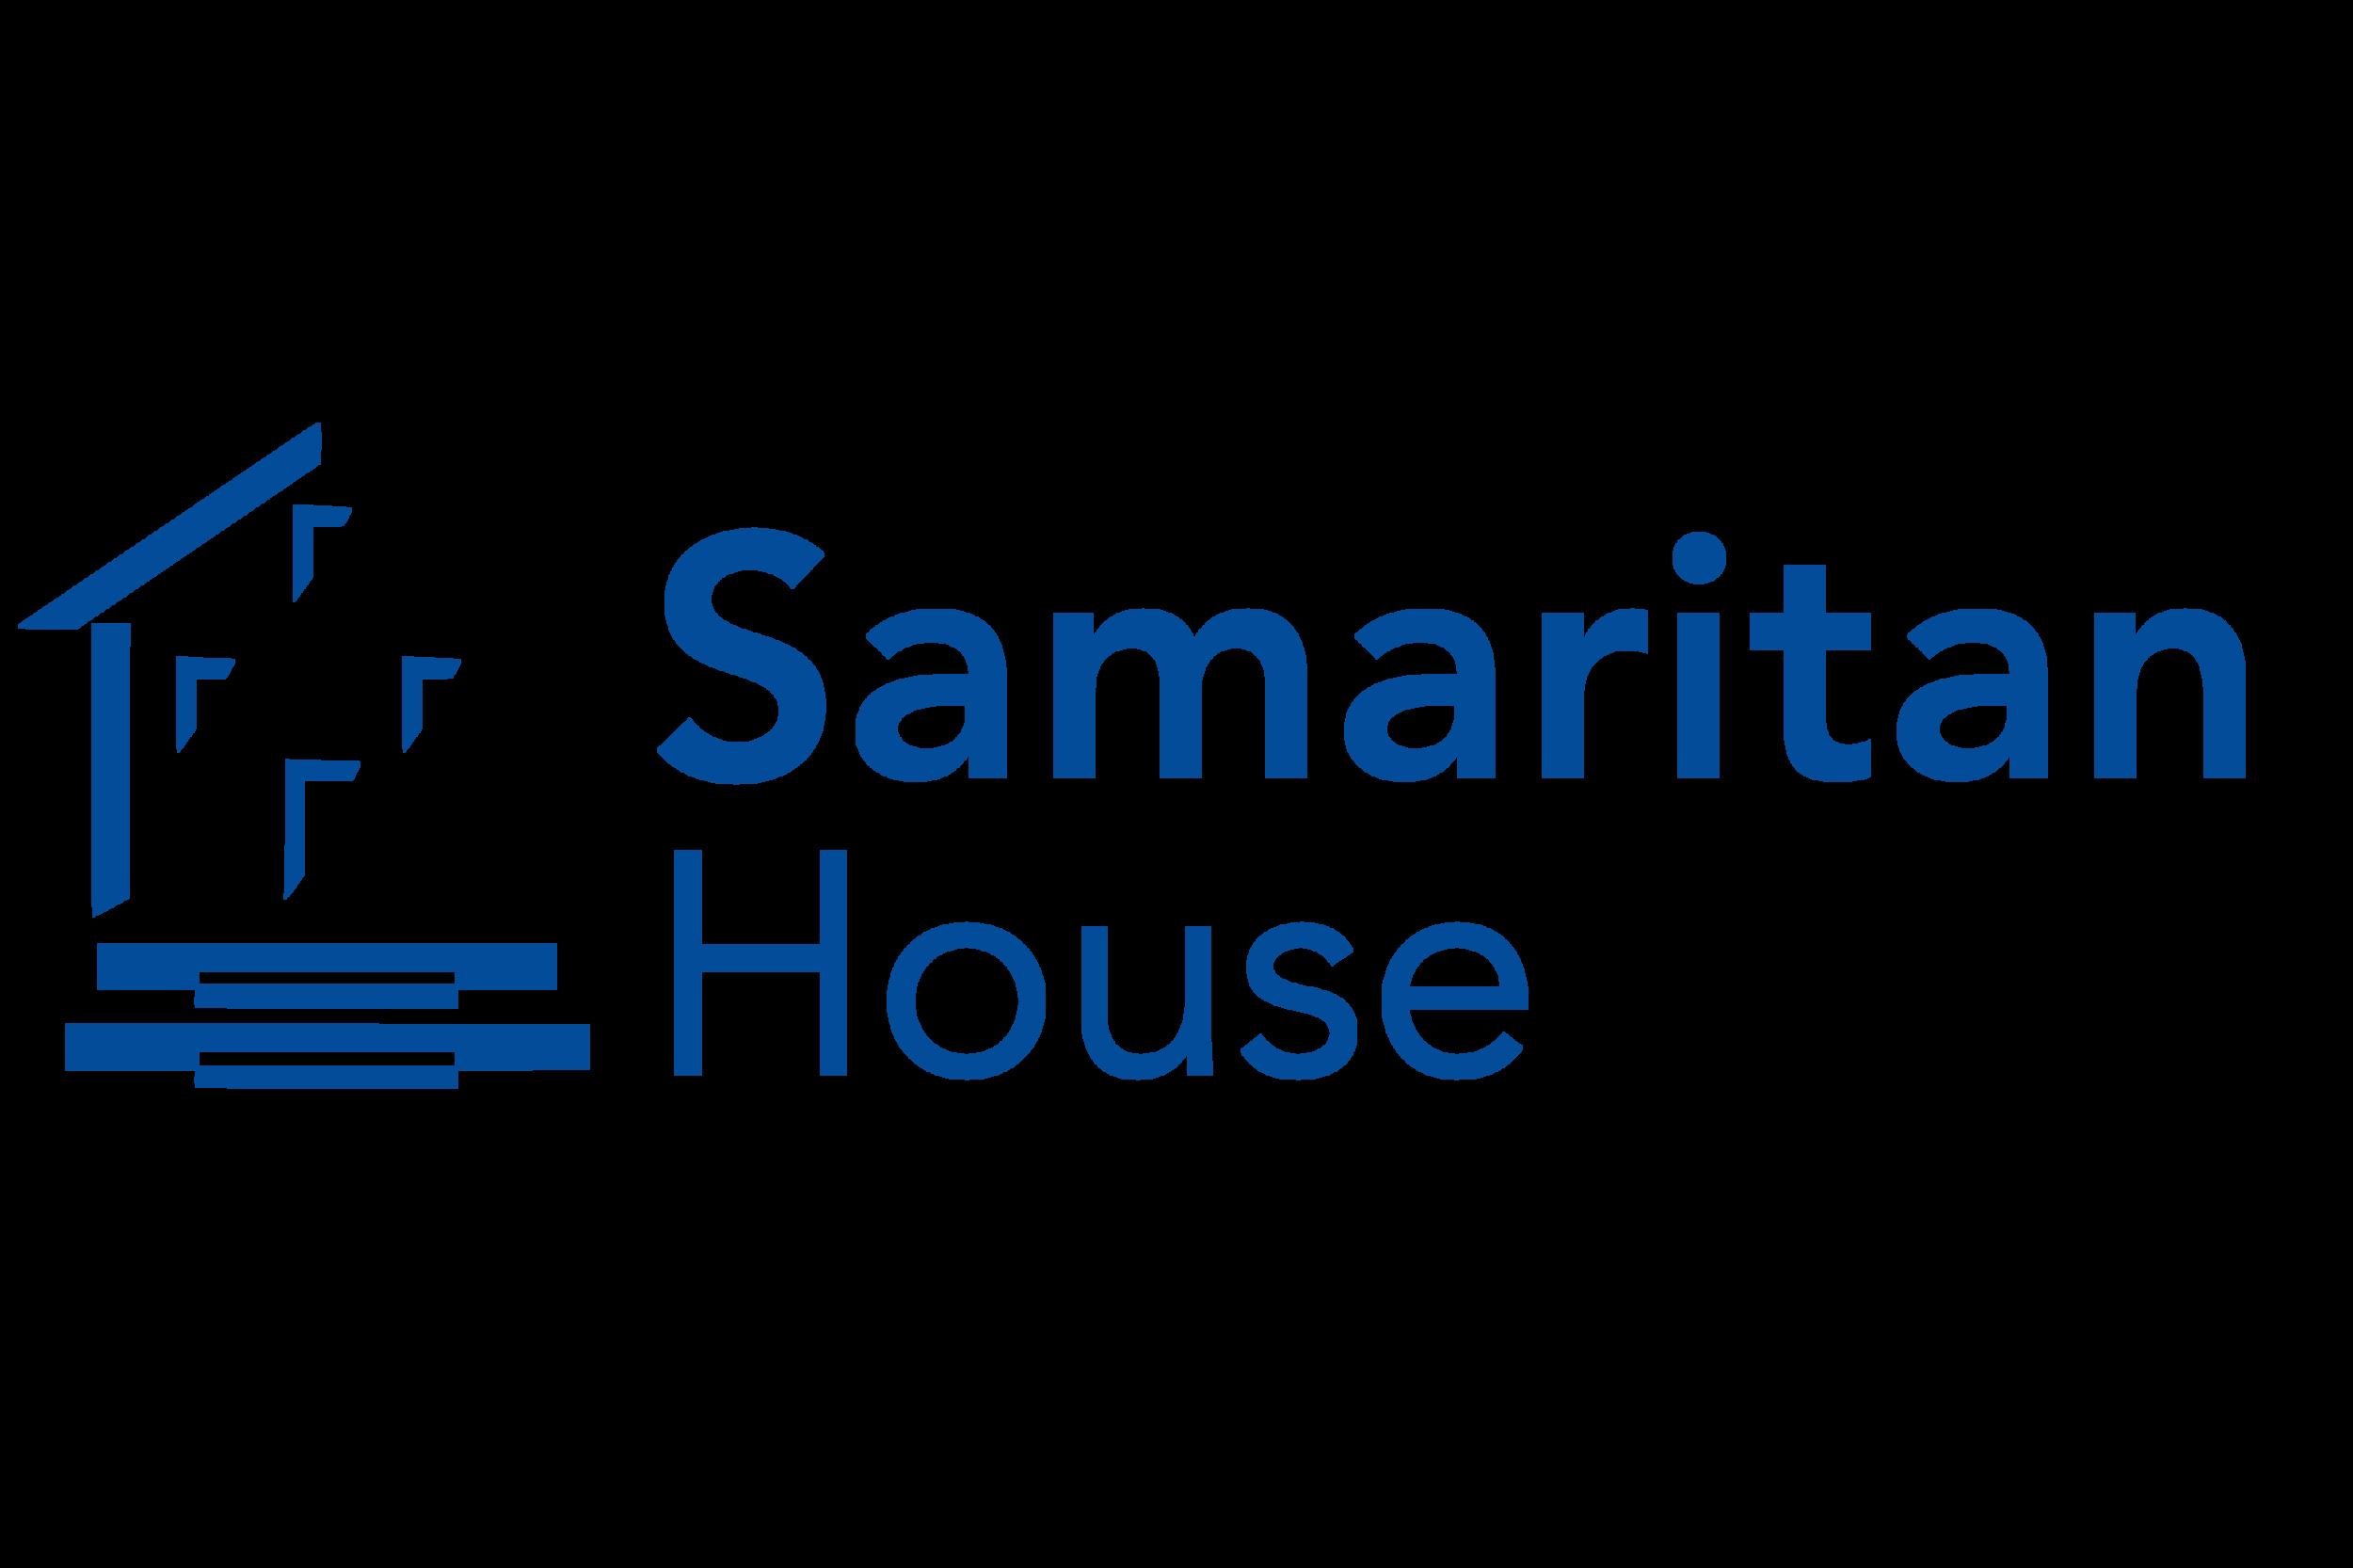 SAMARITAN HOUSE.png